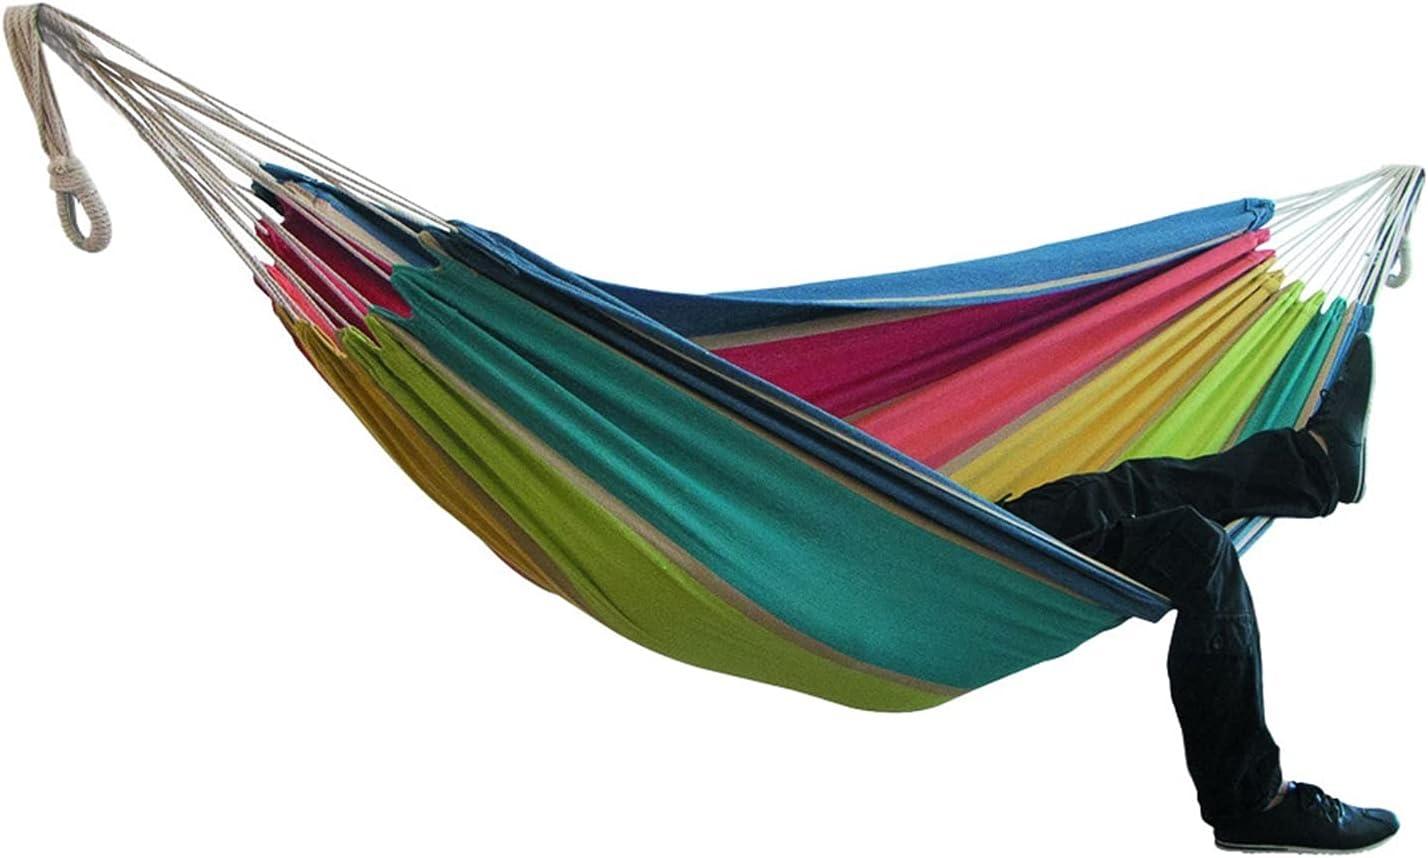 LSXLSD 200150cm Hamock Popular popular Two-Person Swingi Hammock Camping Thicken Sale